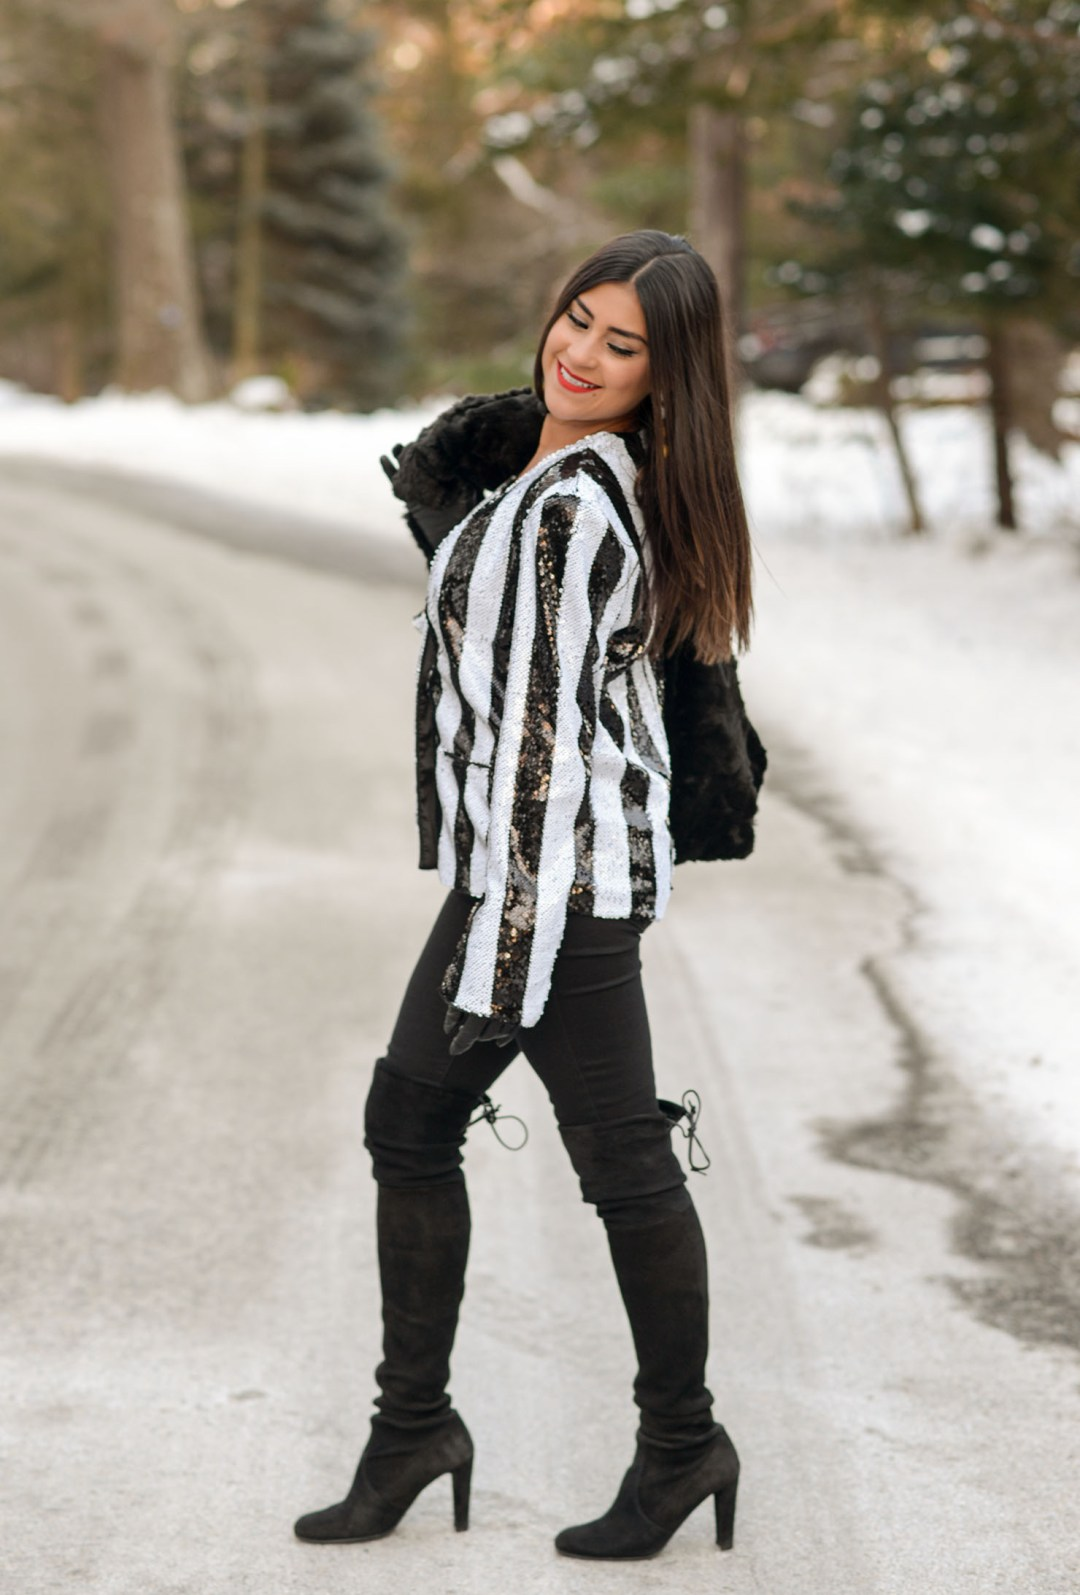 Lifestyle blogger Kelsey Kaplan of Kelsey Kaplan Fashion wearing sequin blazer and Stuart Weitzman OTK boots